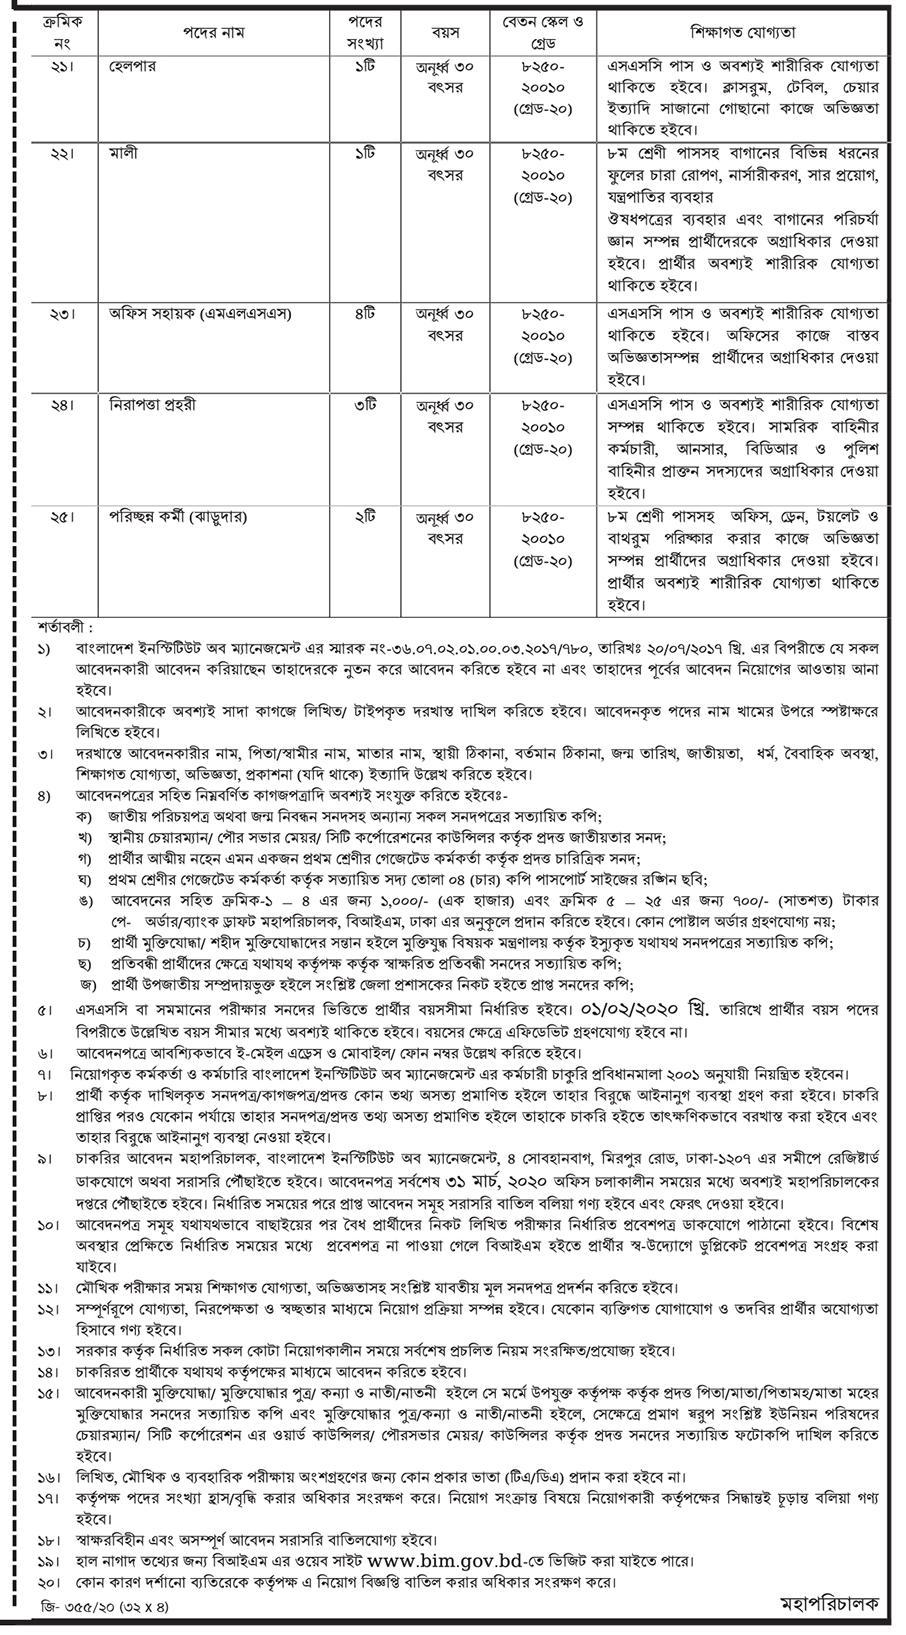 Bangladesh Institute of Management (BIM)